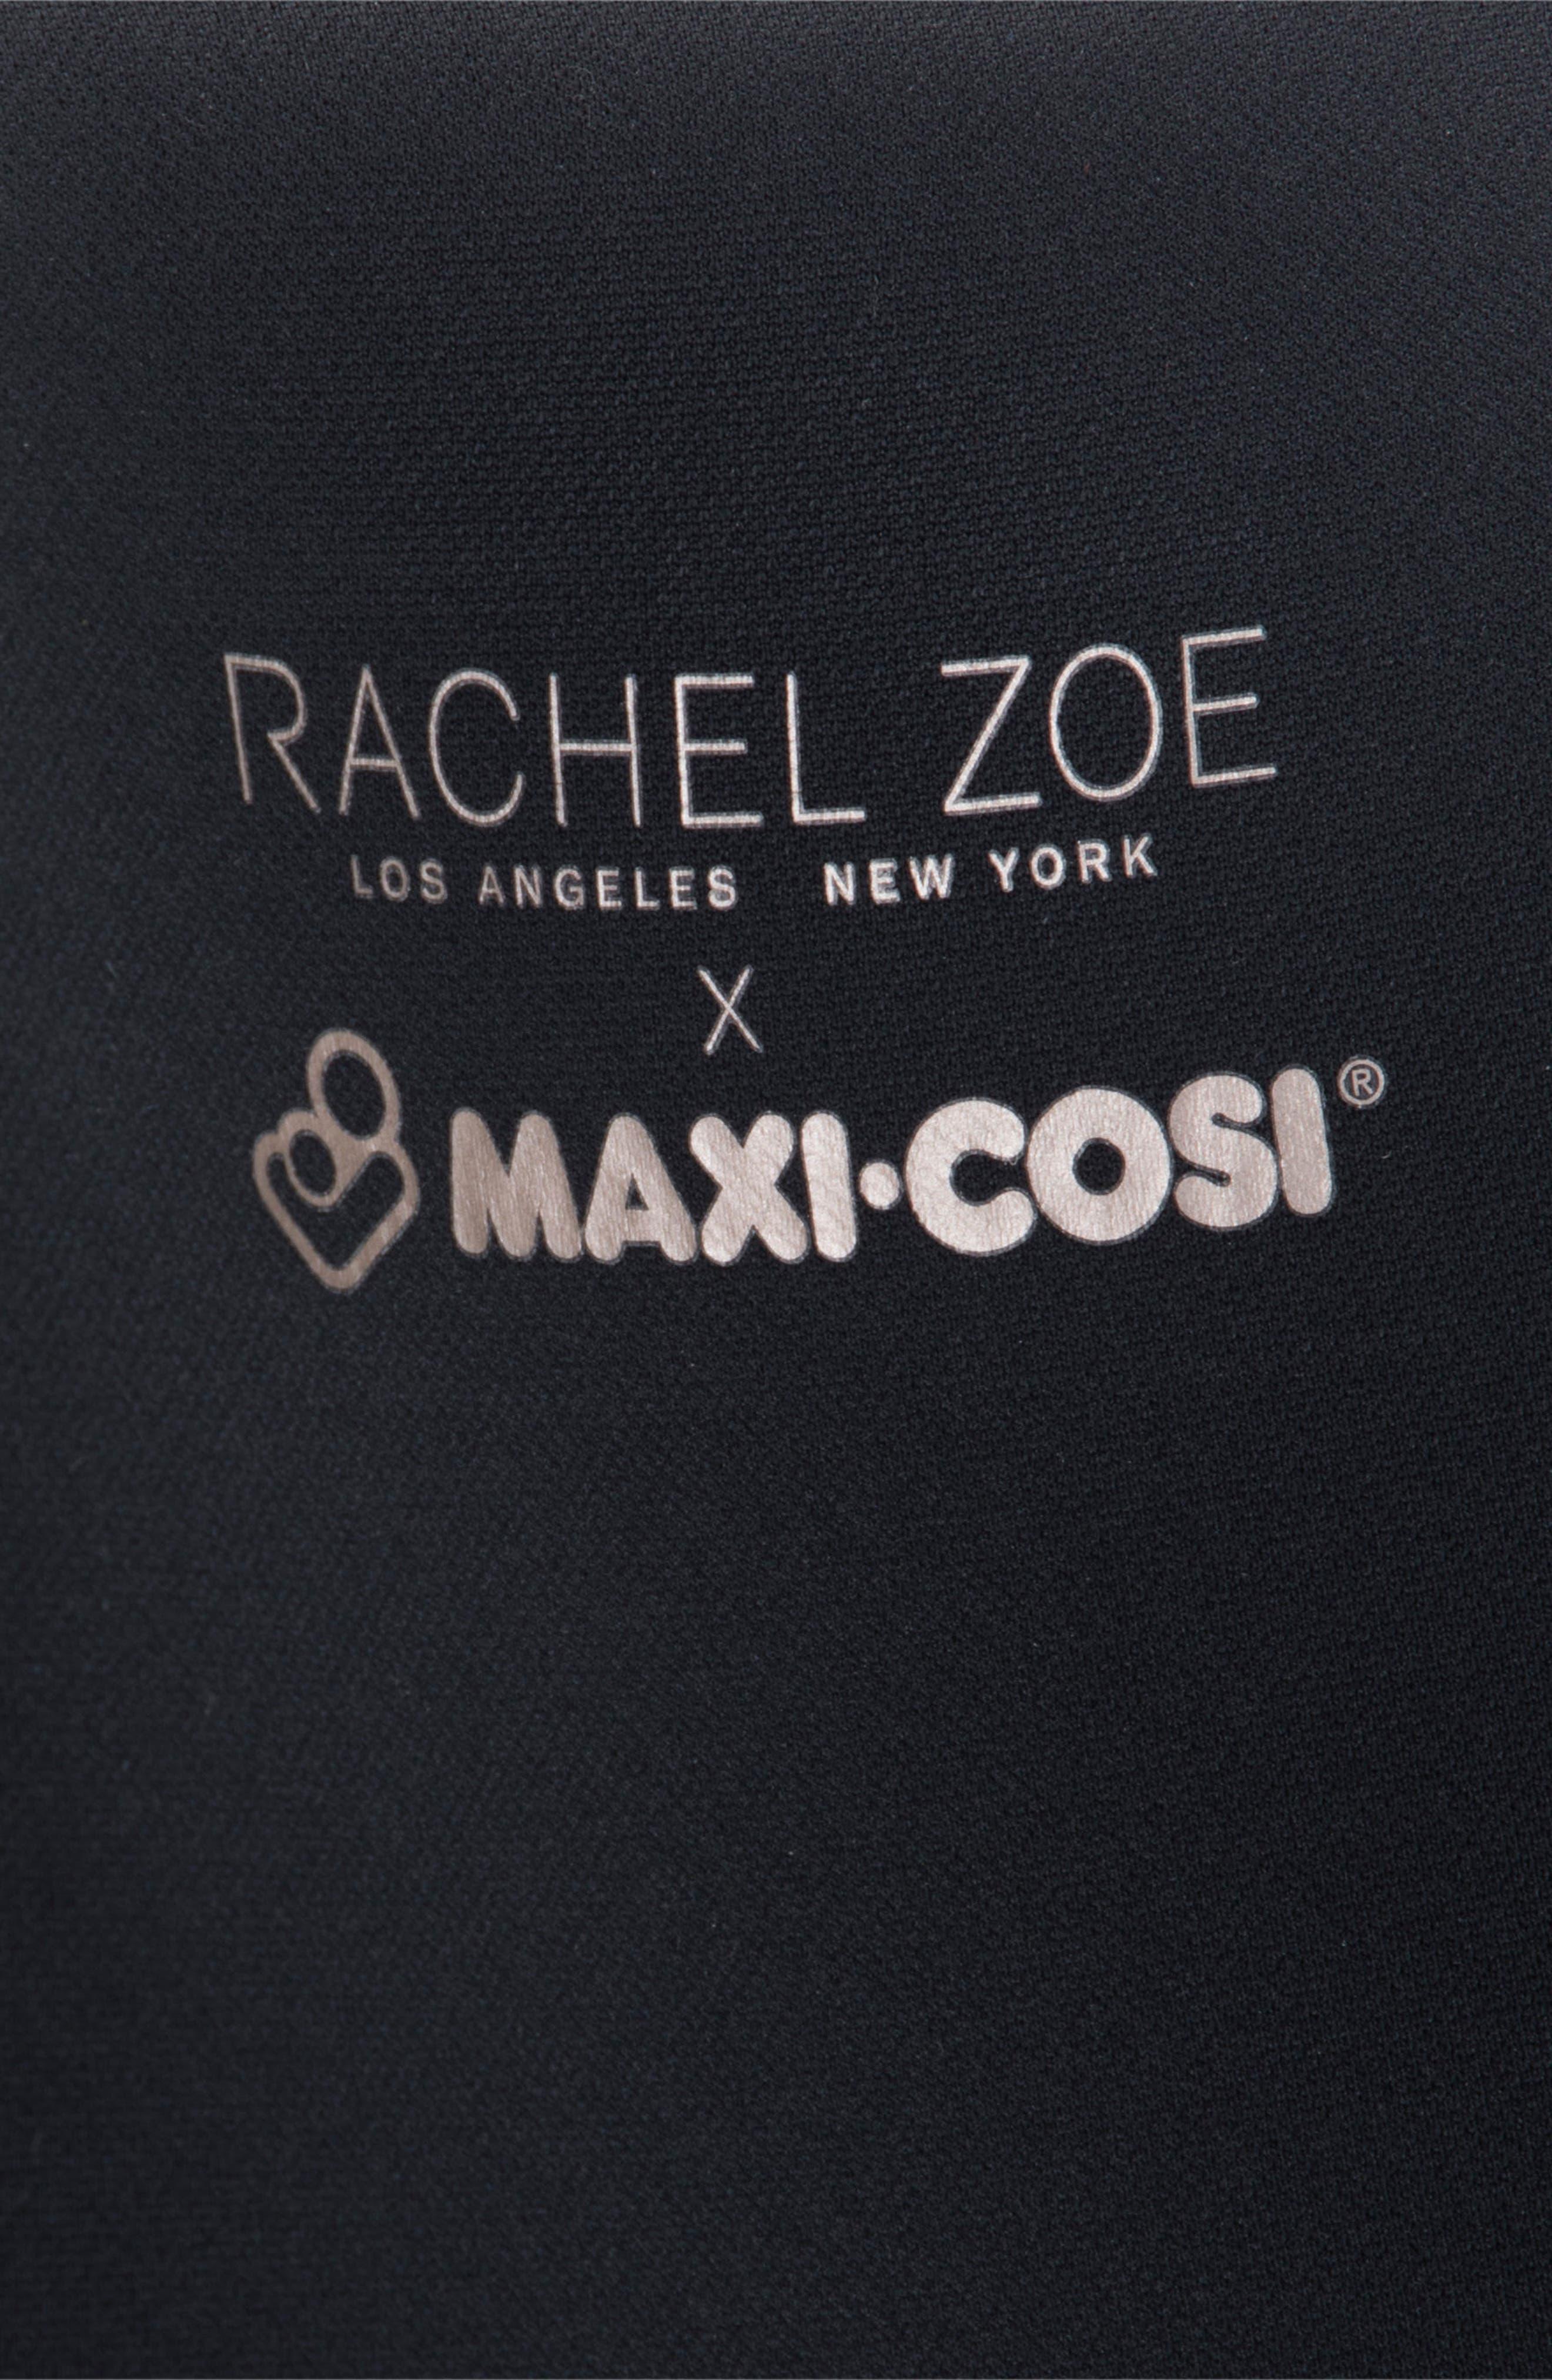 x Rachel Zoe Pria<sup>™</sup> 85 Luxe Sport Max Convertible Car Seat,                             Alternate thumbnail 12, color,                             Rz Luxe Sport